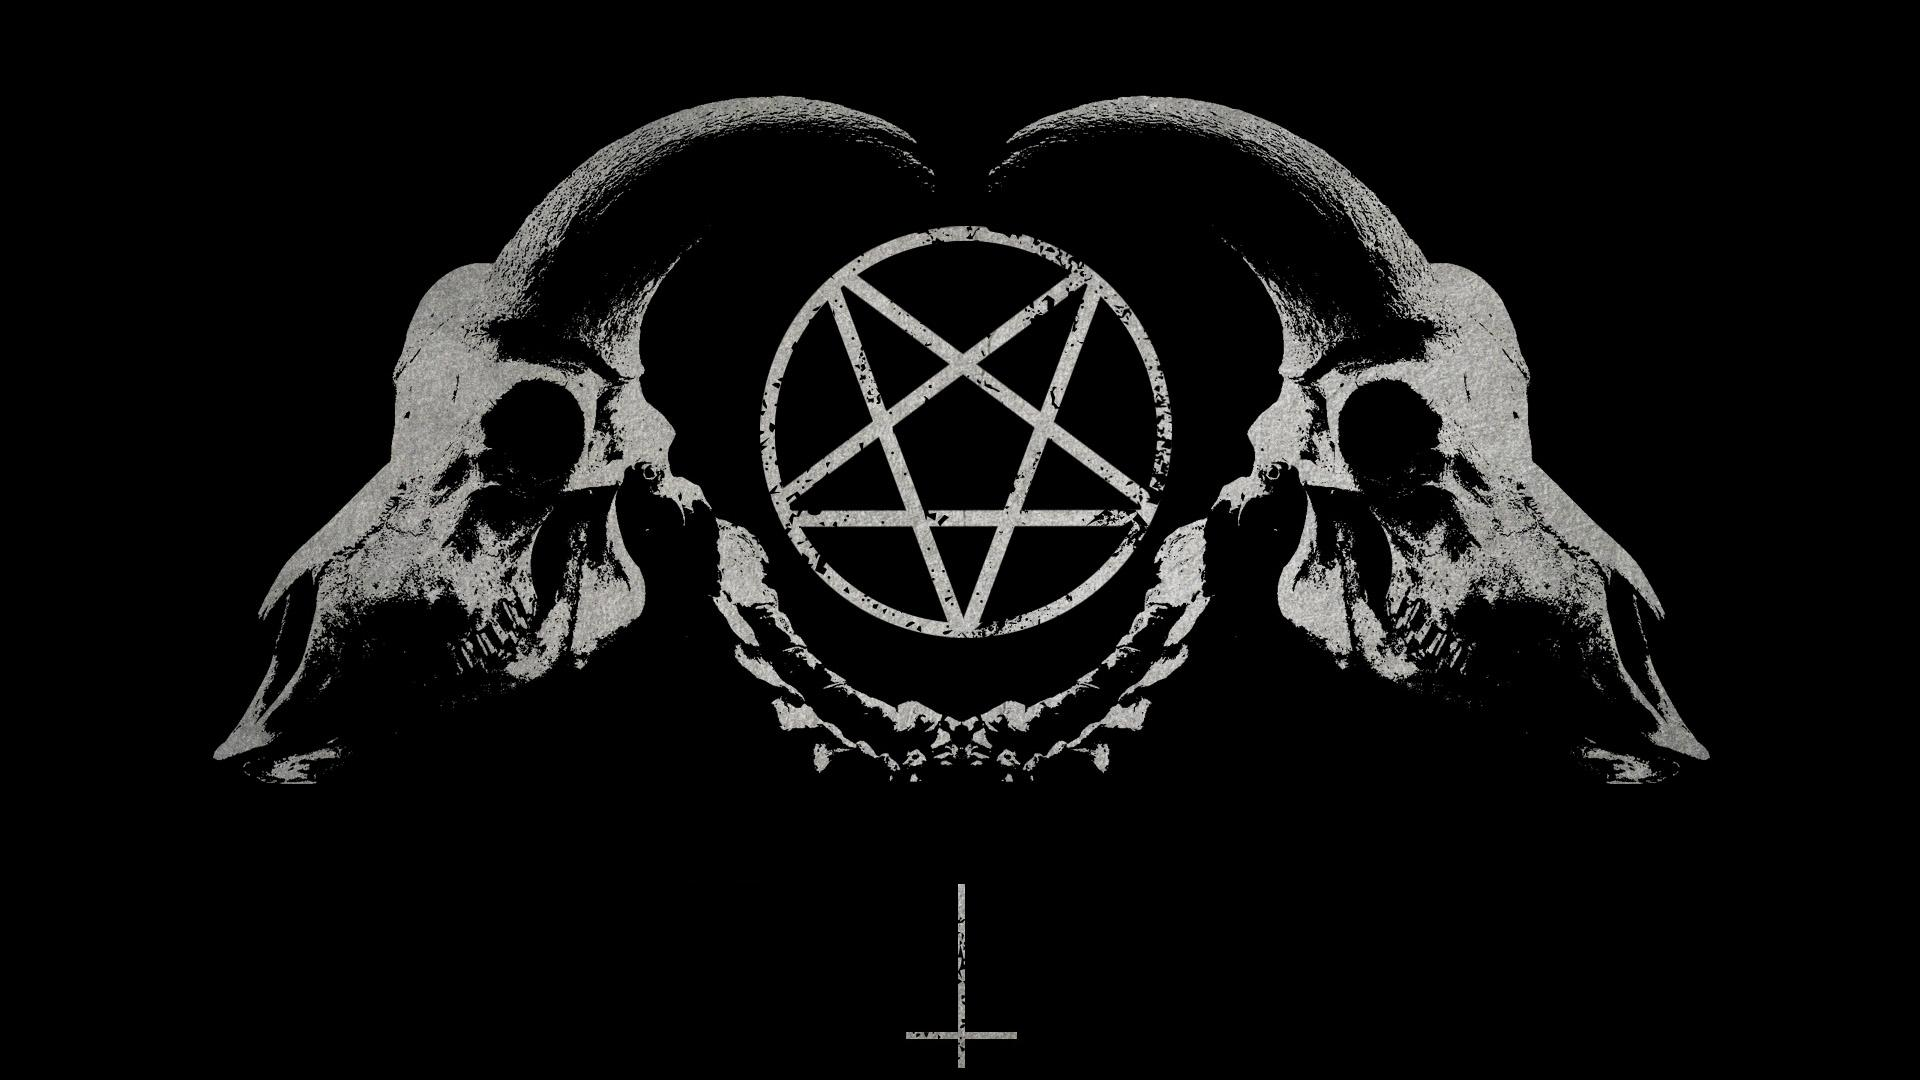 Posesion {terror} Tumblr_static_horror-skull-dark-gothic-occult-satan-penta-symbol-horns-181974